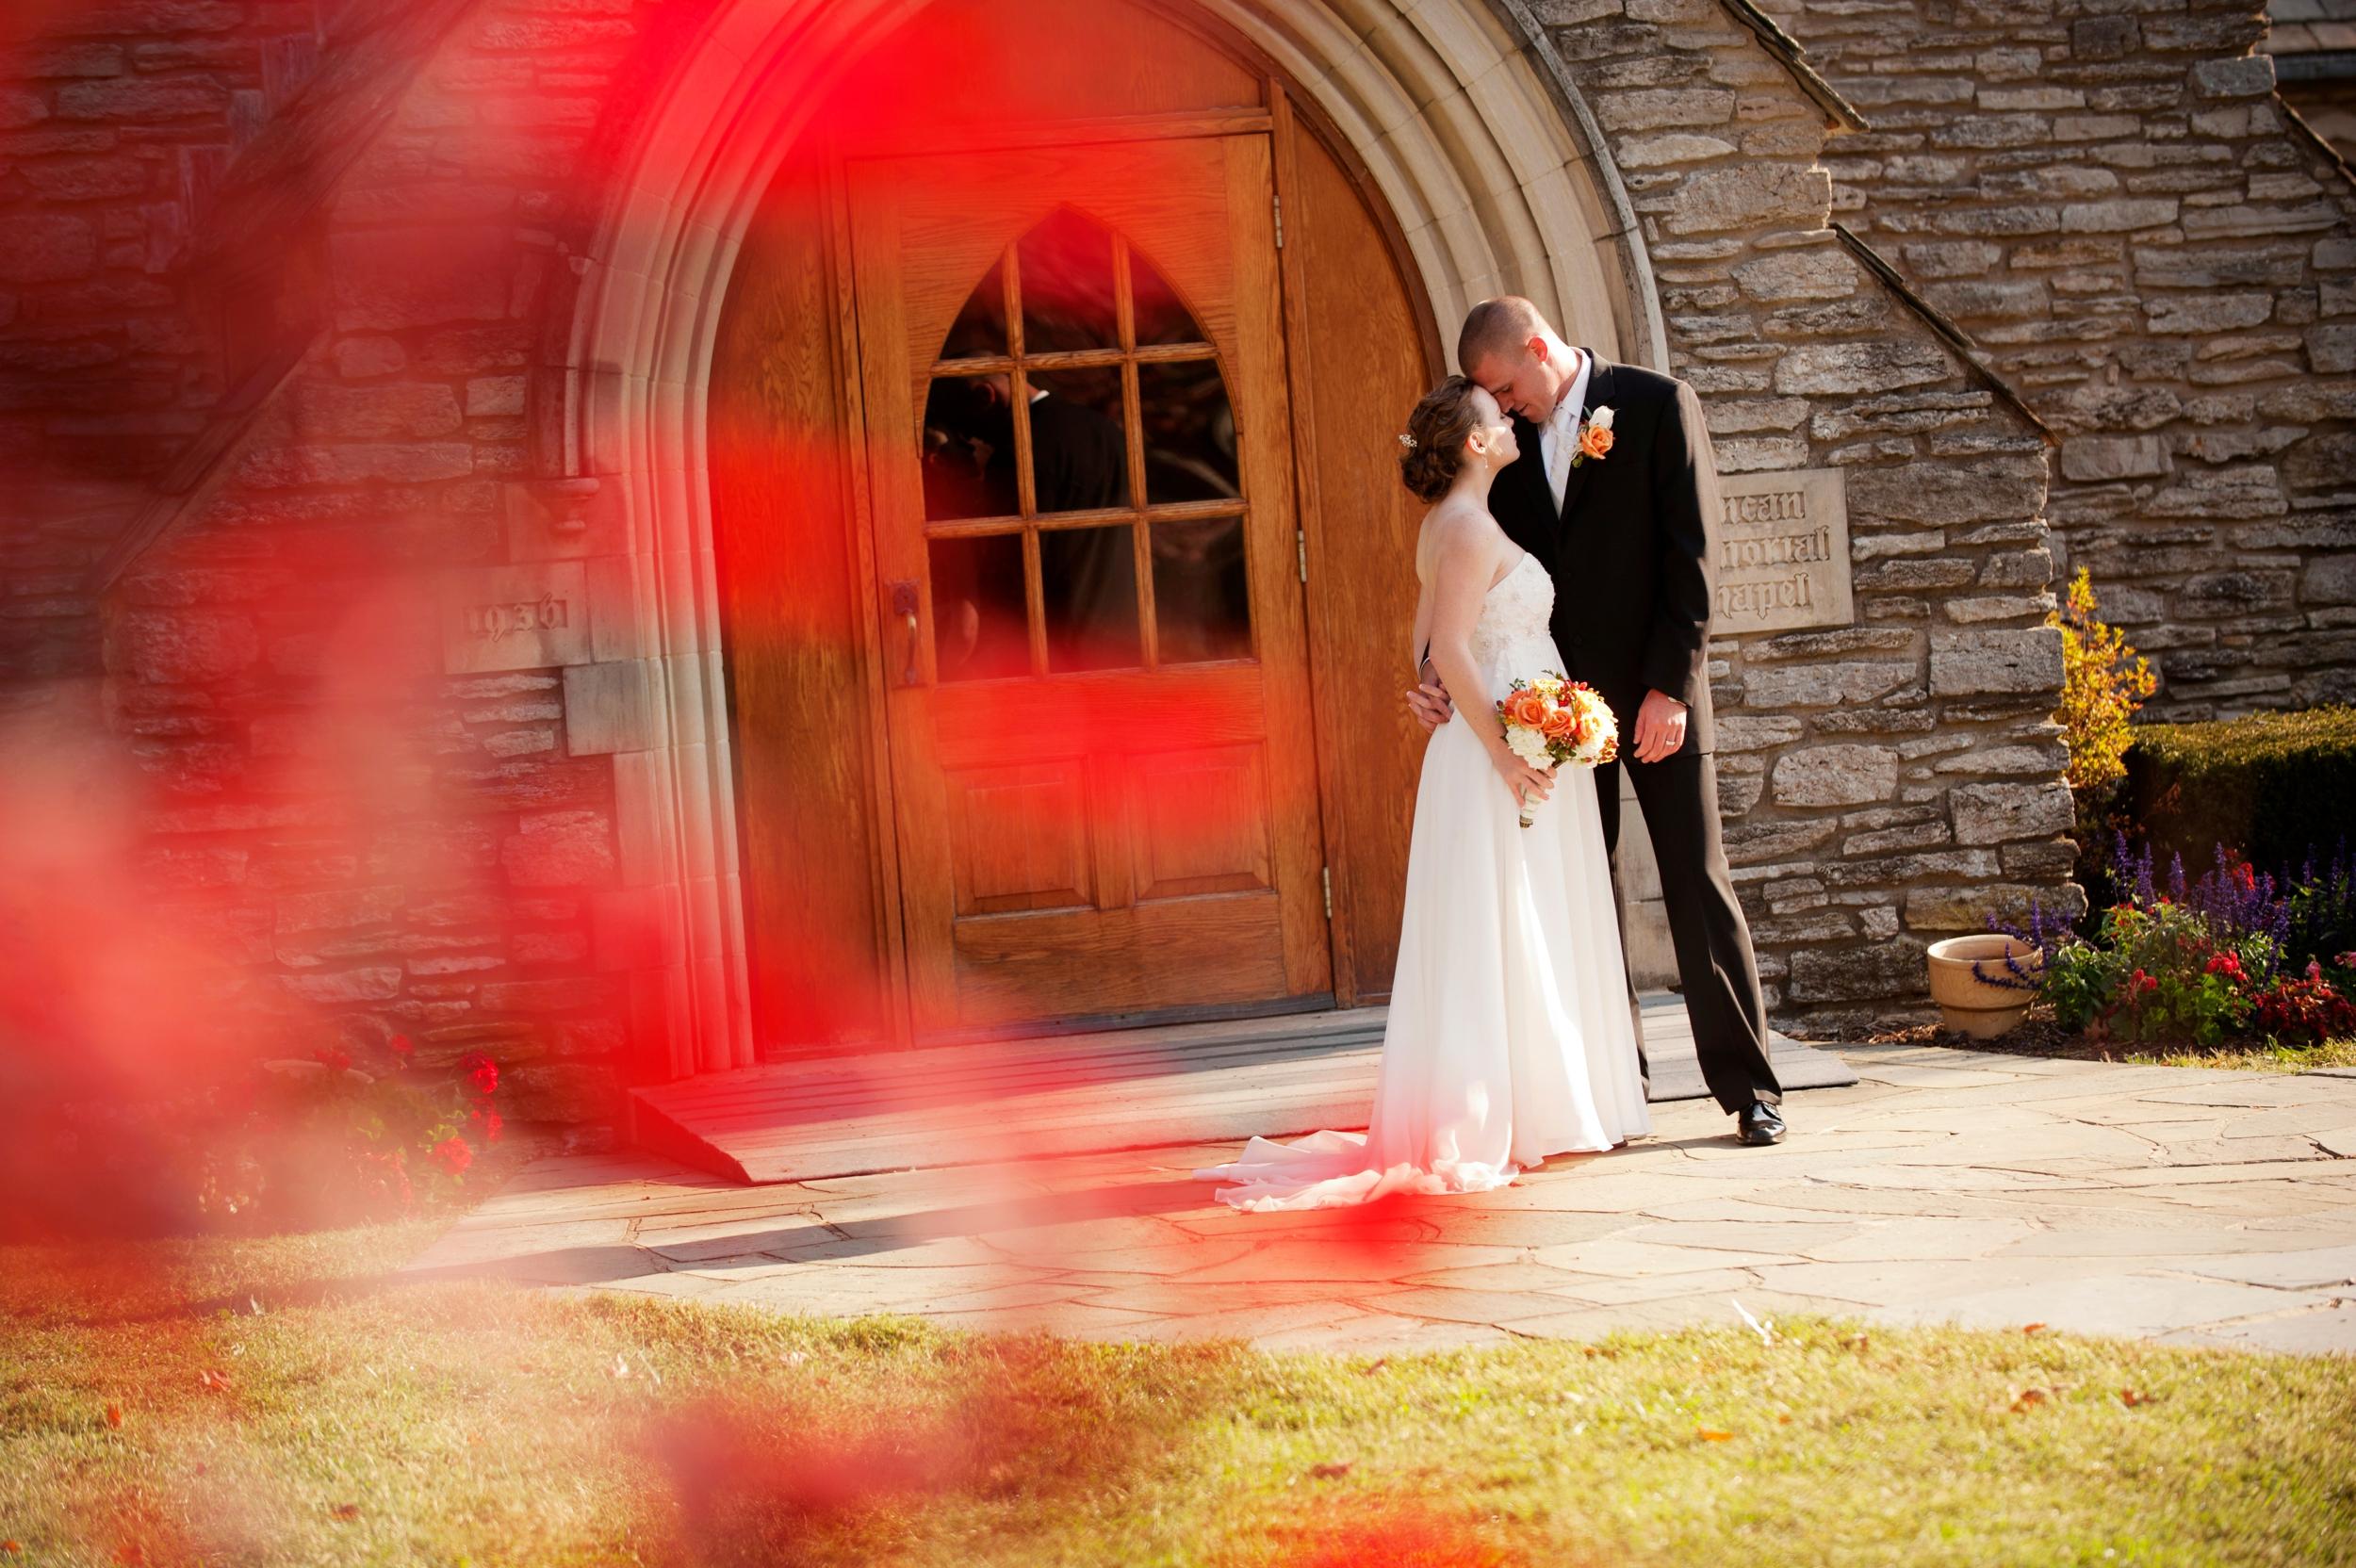 47-duncan-memorial-fall-wedding.JPG